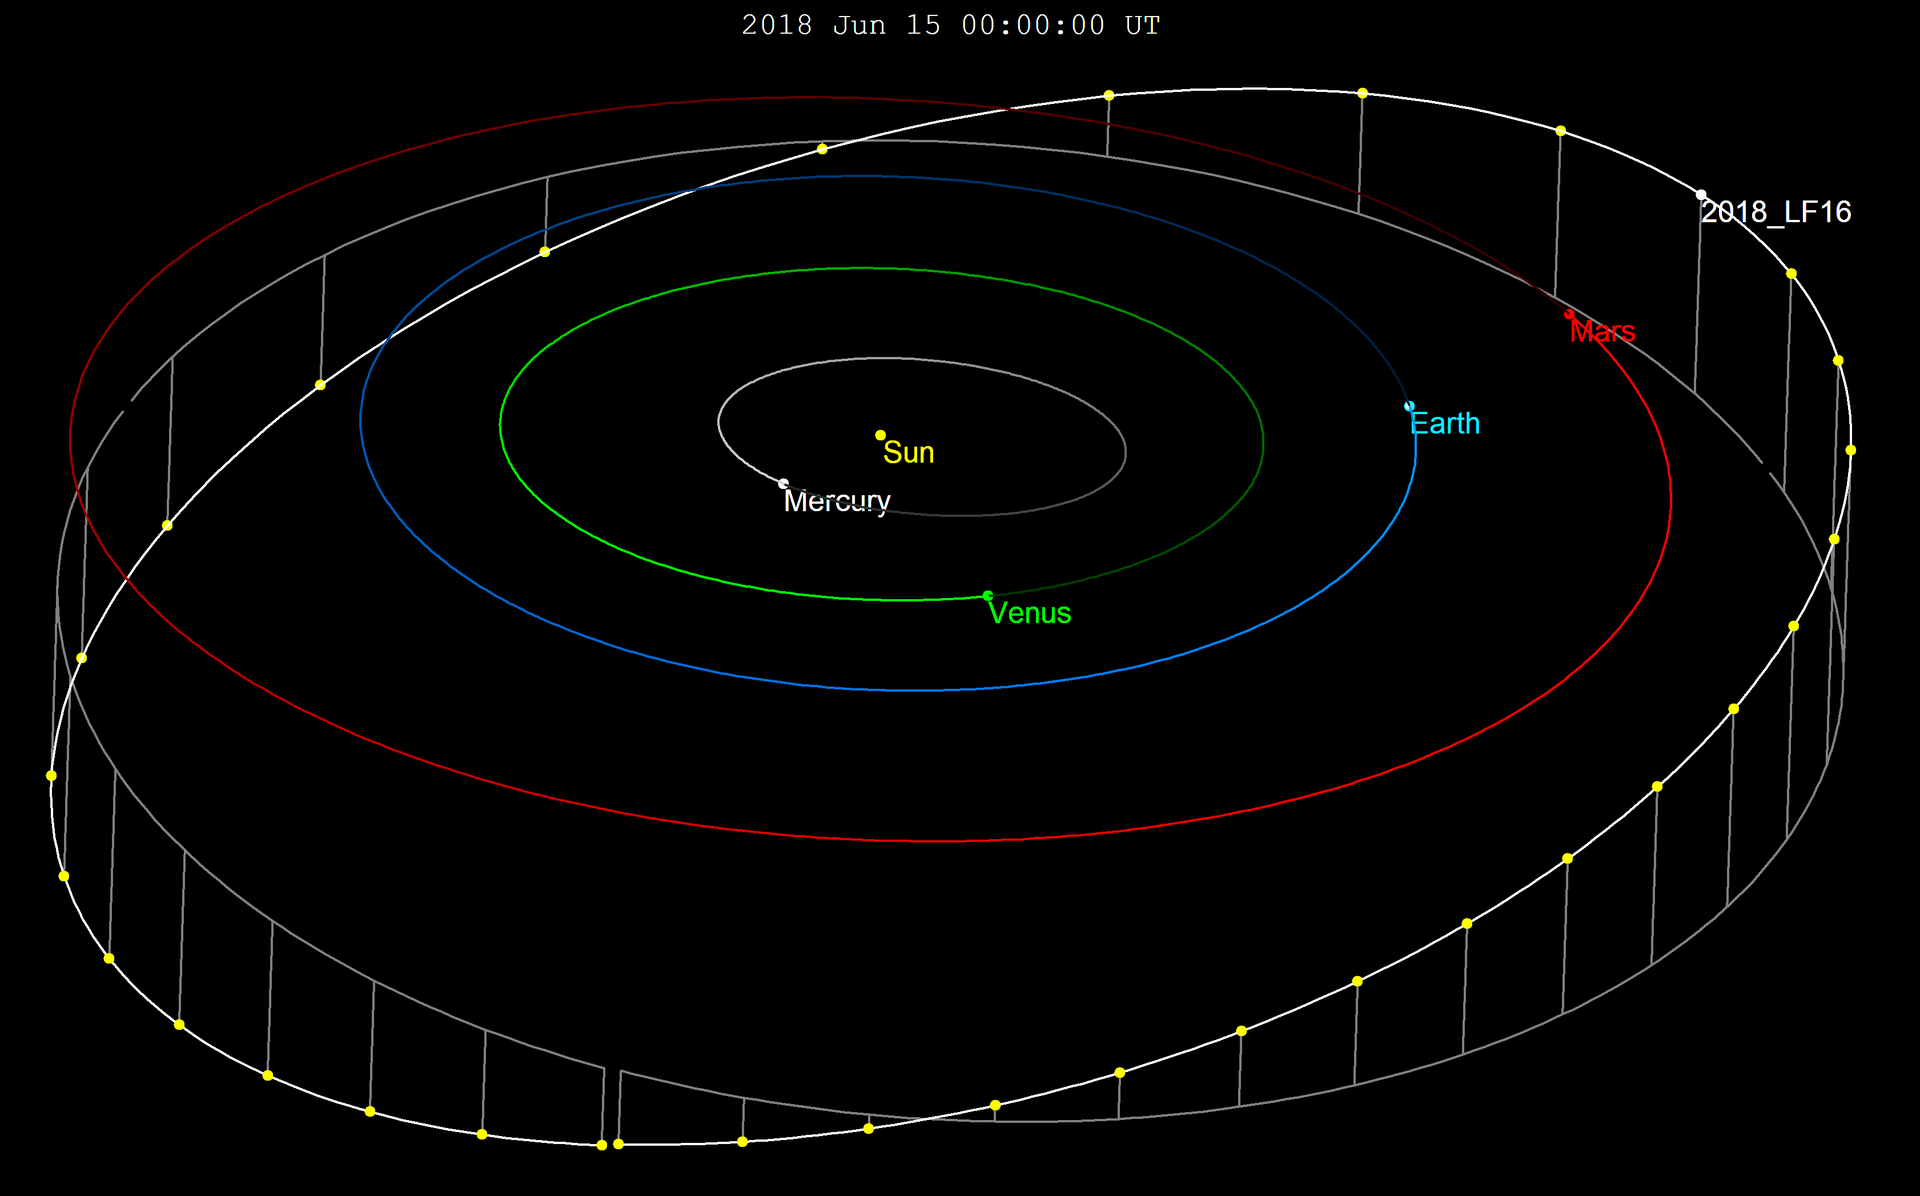 2018 LF16-orbit.png